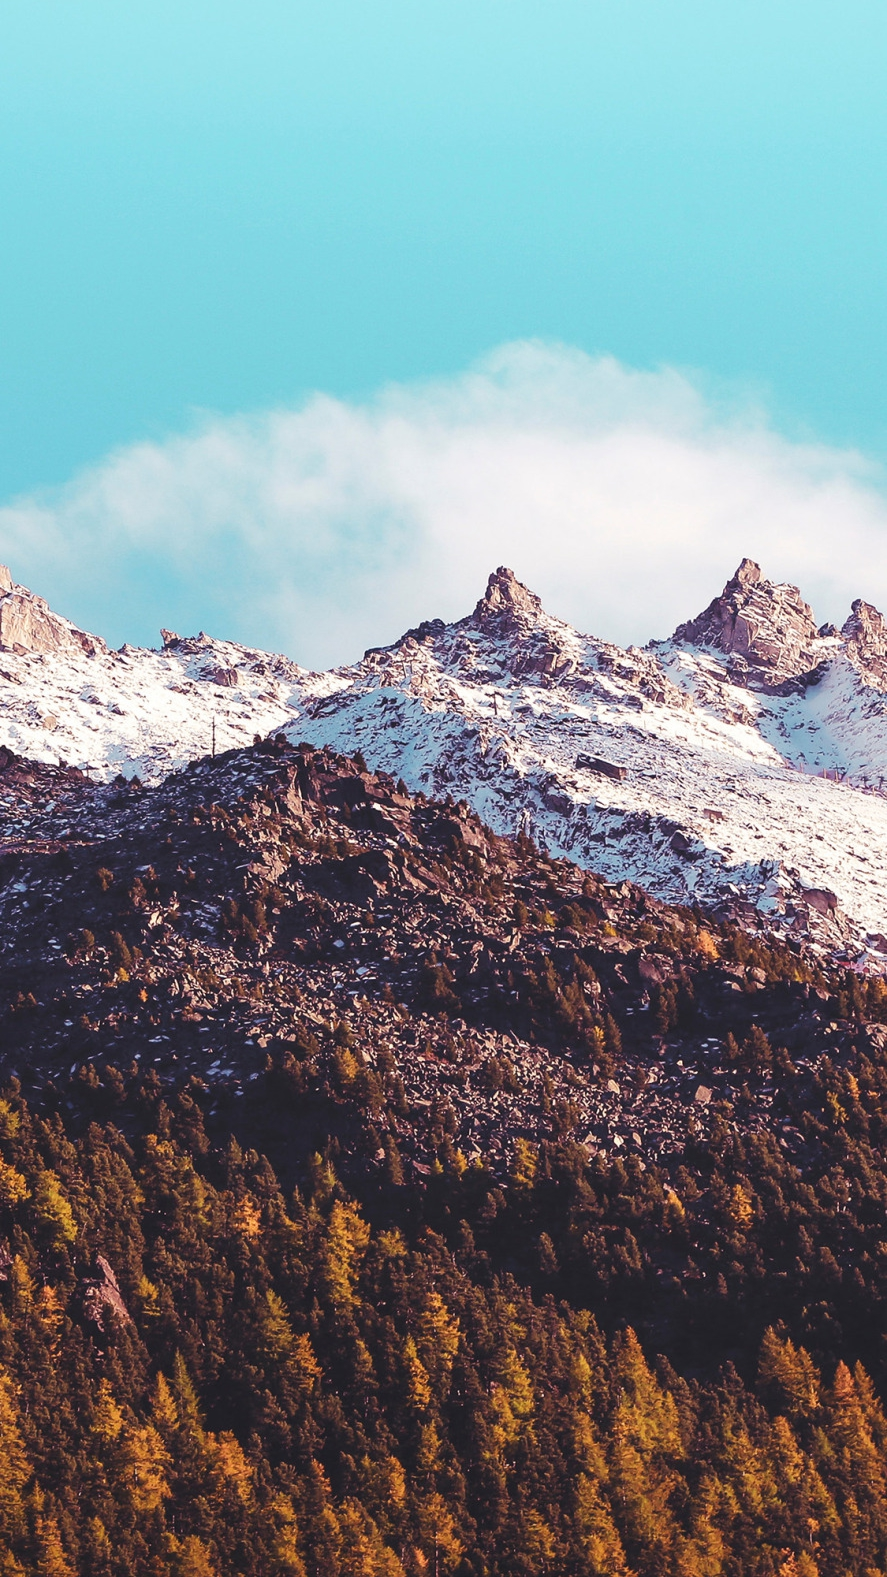 Blue Sky Snow Mountains Nature iPhone Wallpaper iphoneswallpapers com